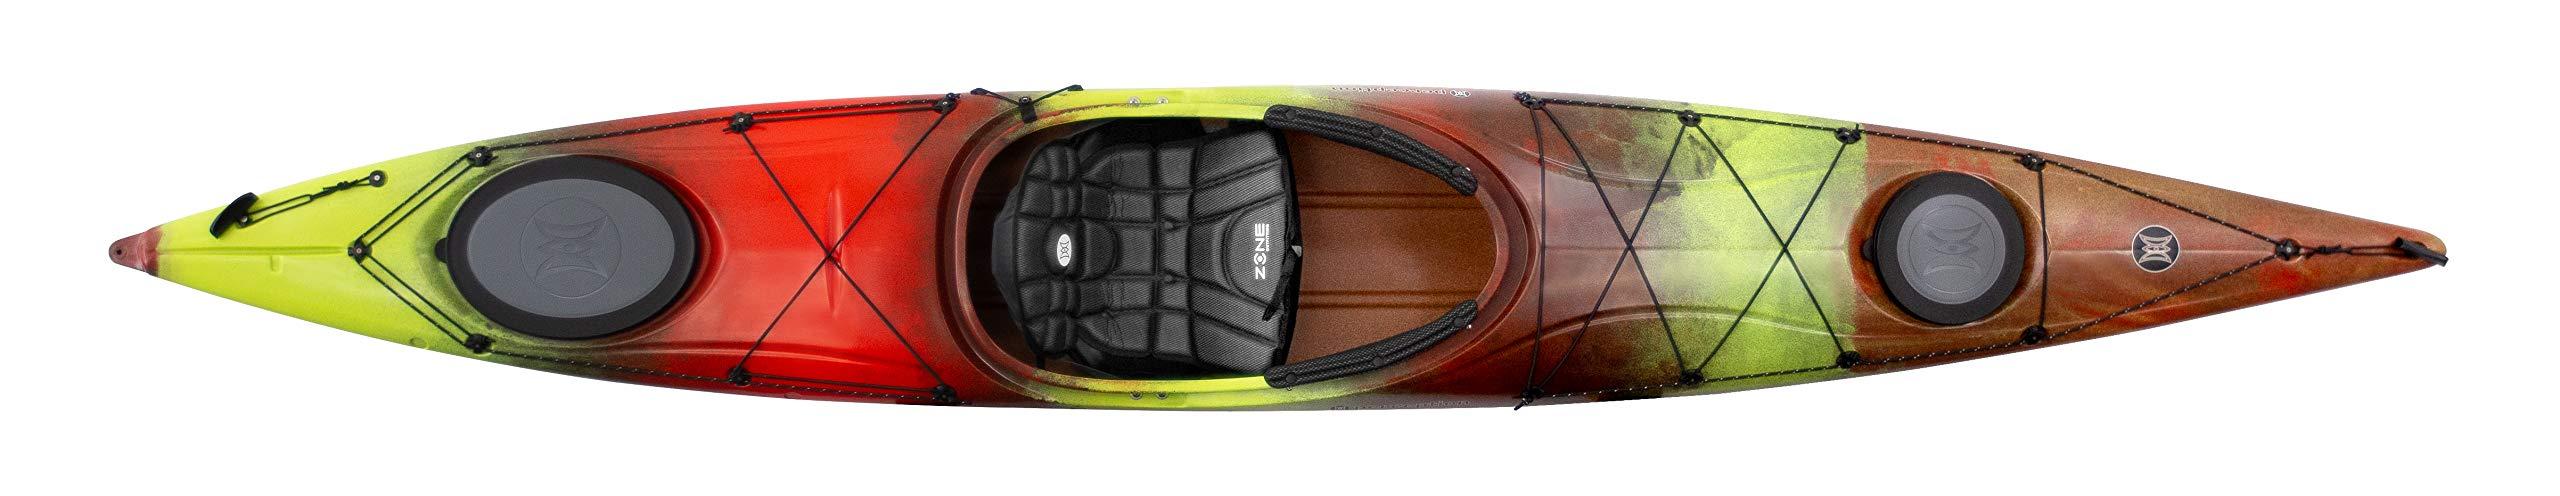 Perception Carolina 14 | Sit Inside Kayak for Adults | Touring Kayak | 14' | Salsa by Perception Kayaks